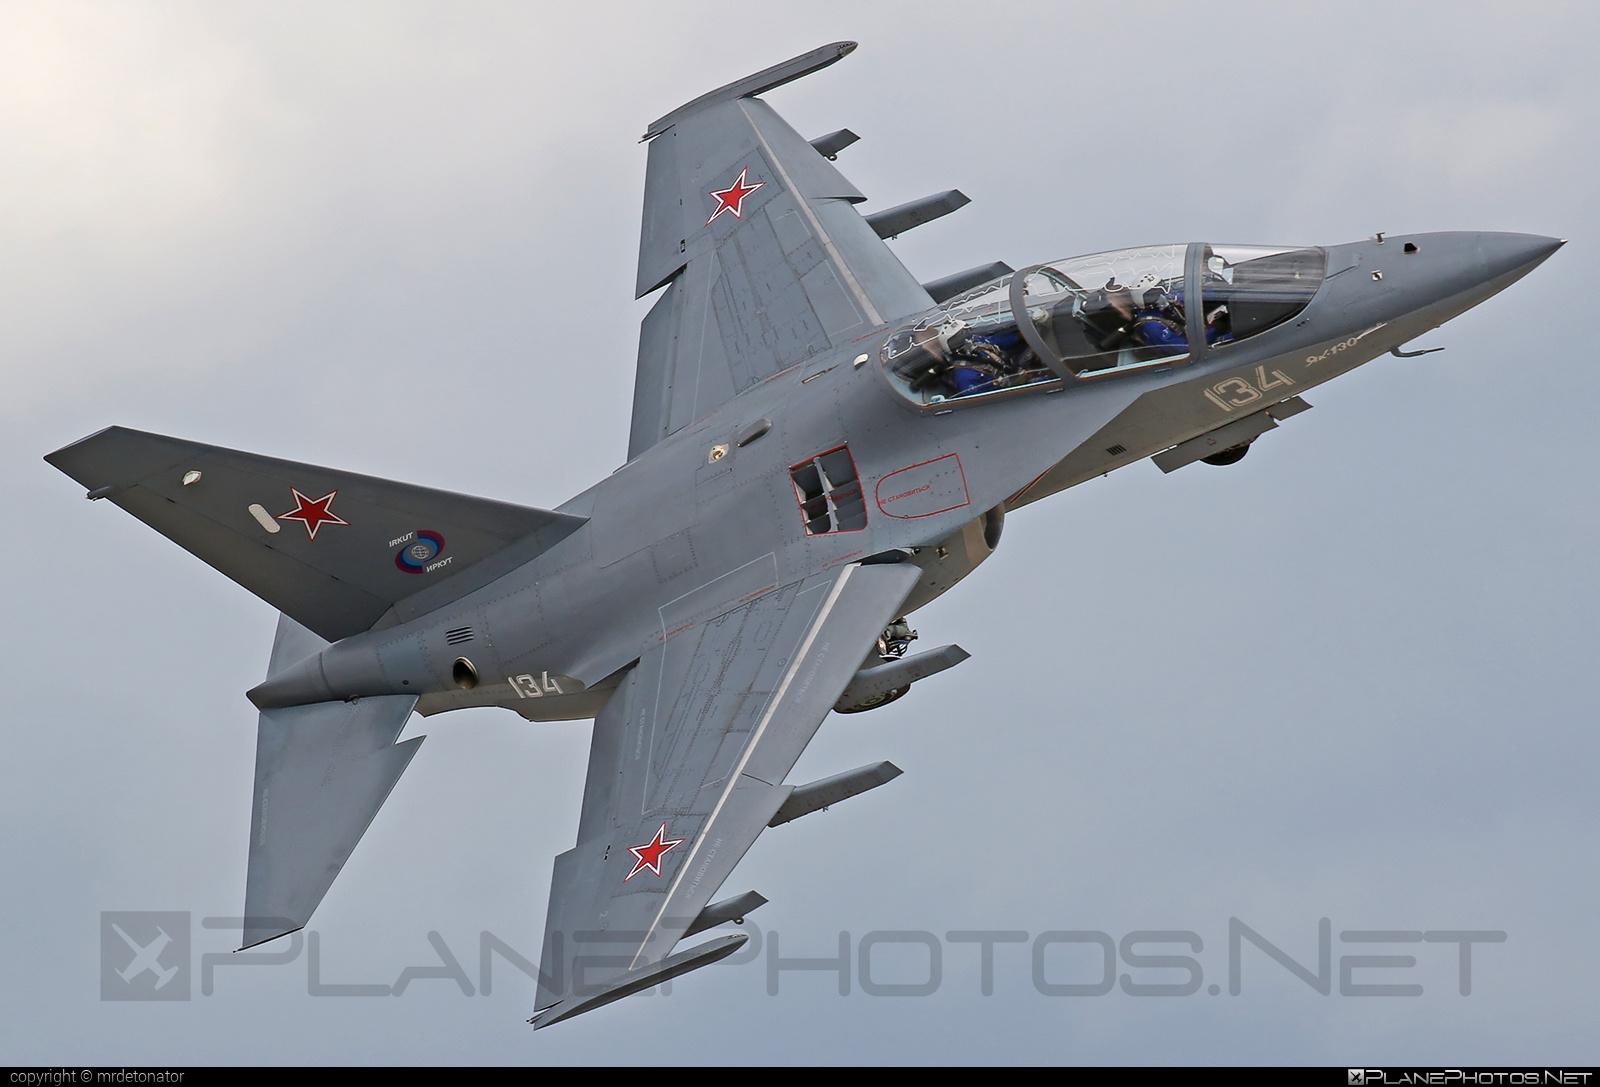 Yakovlev Yak-130 - 134 operated by Yakovlev Design Bureau #yak #yak130 #yakovlev